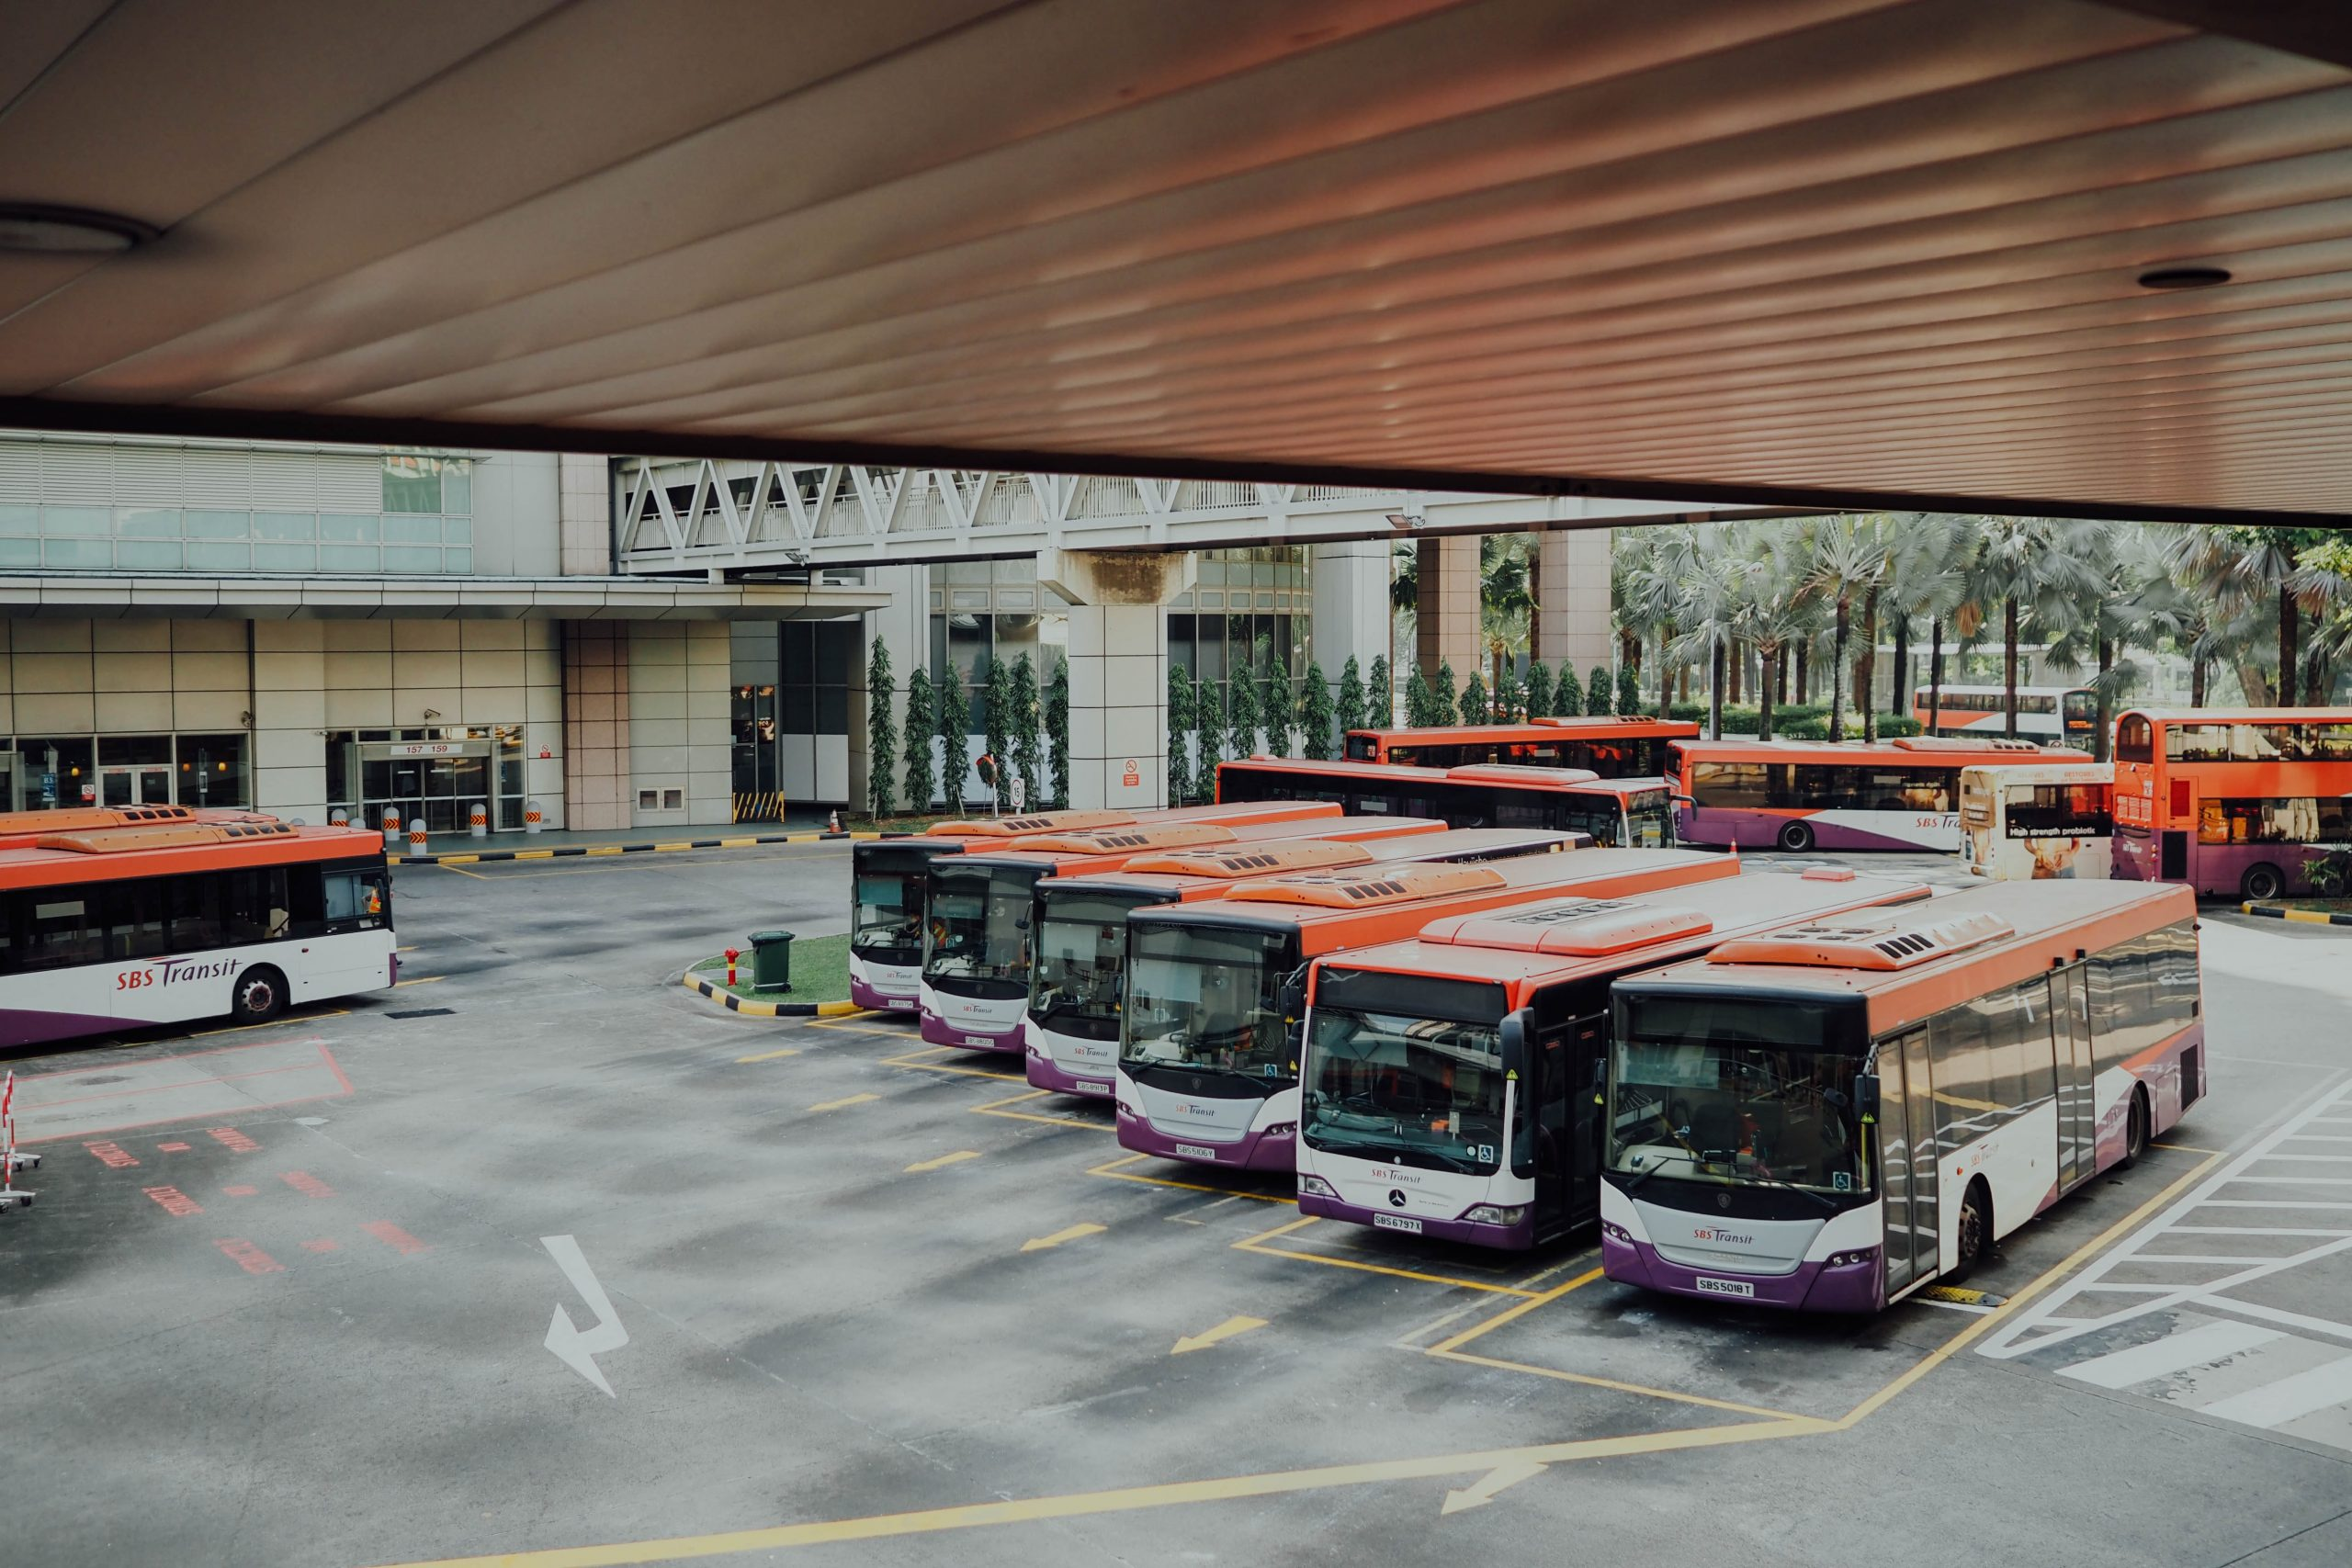 bus, bus eta, school, student, tracking, gps, telematics, zenduit